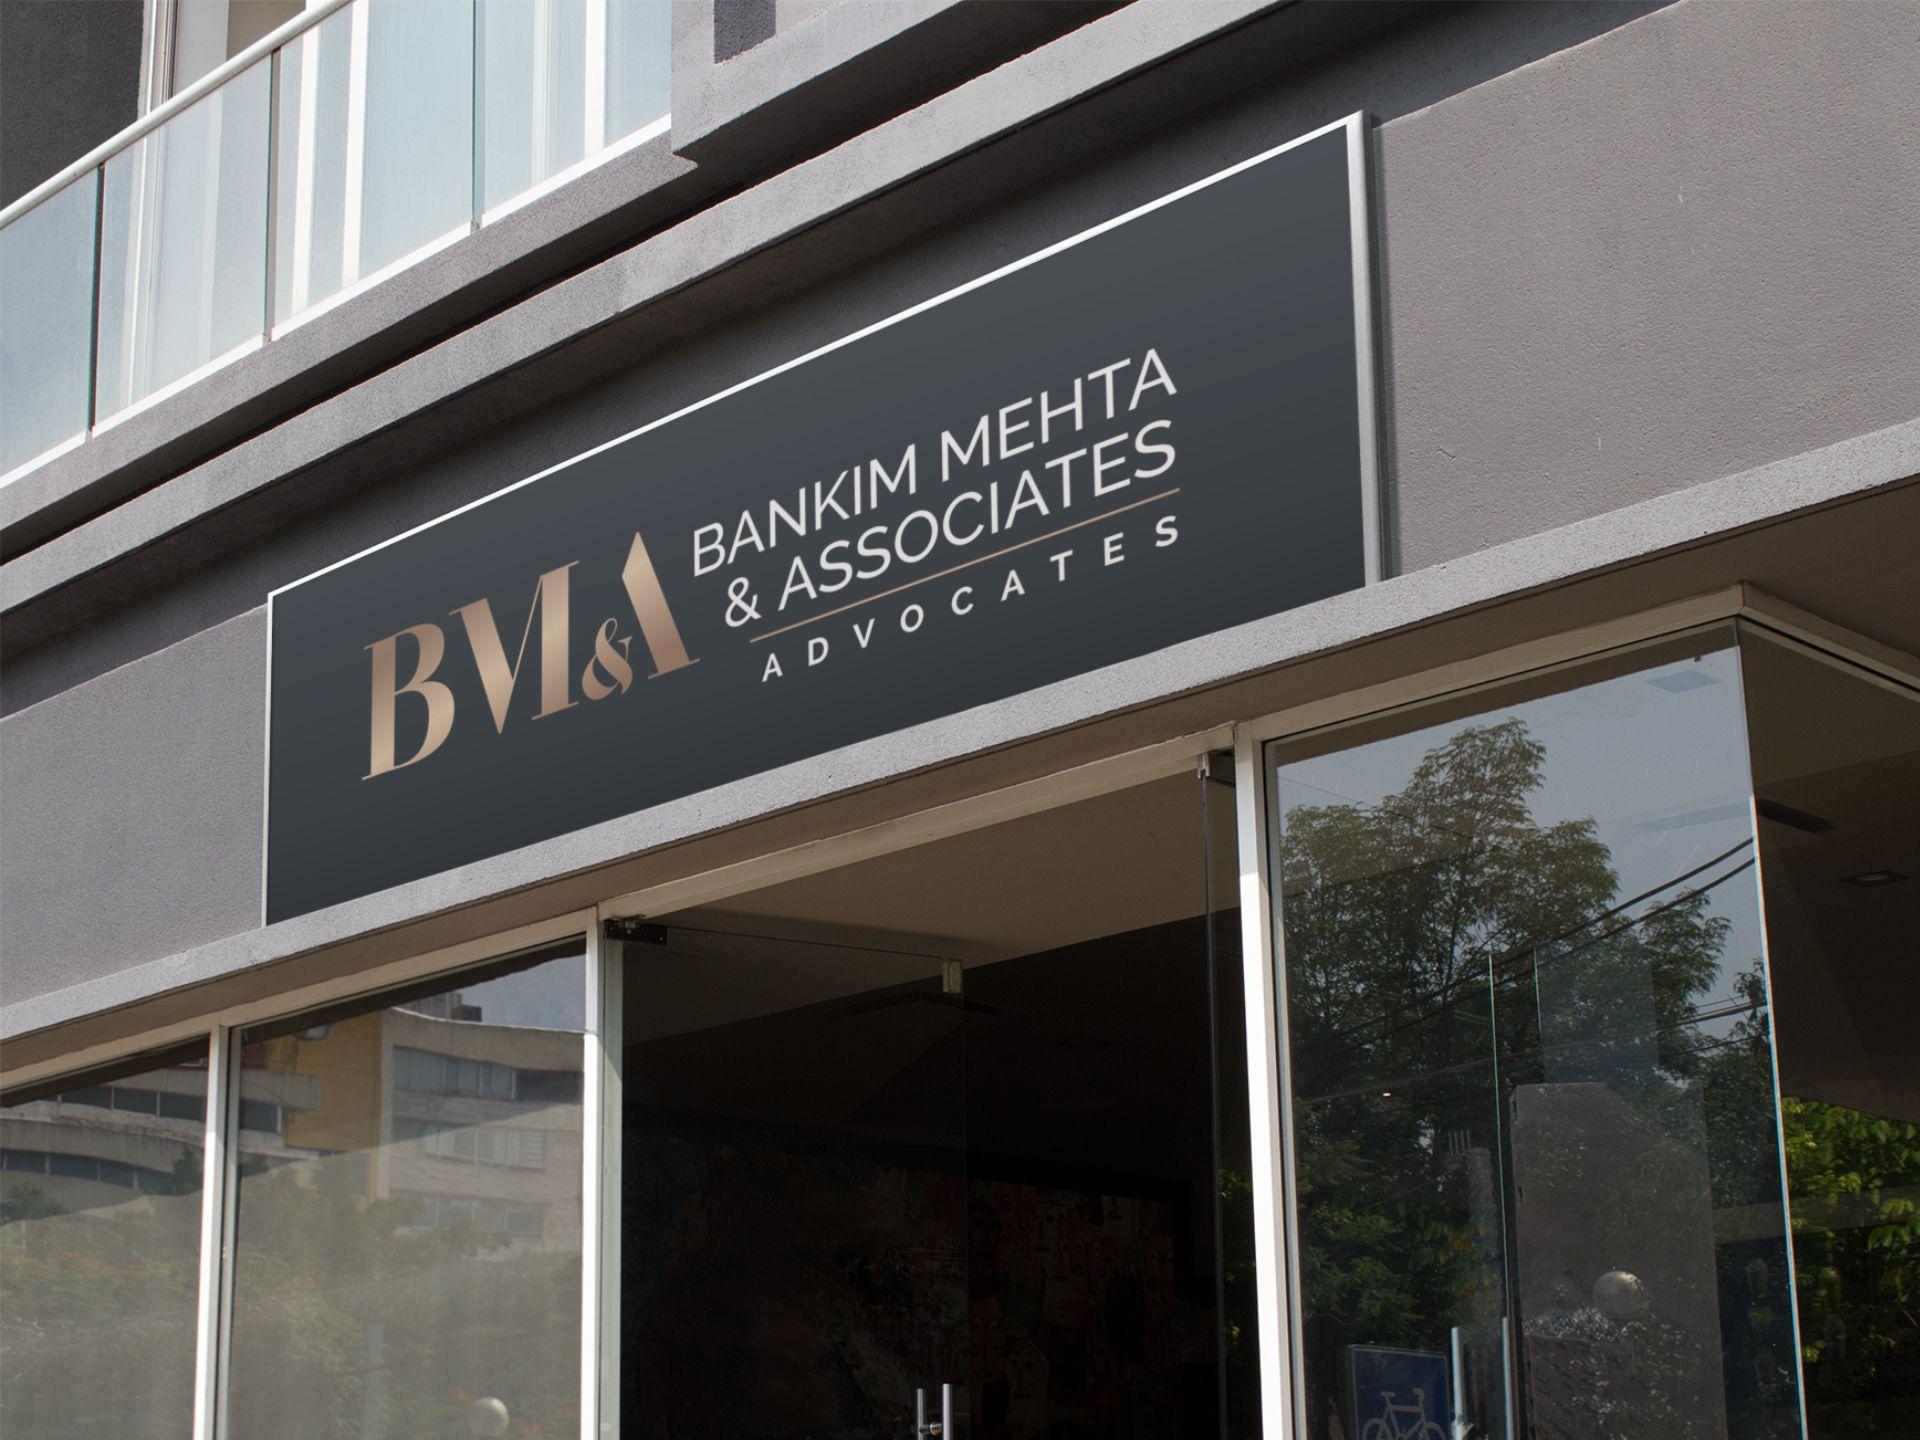 Bankim Mehta & Associates - Logo